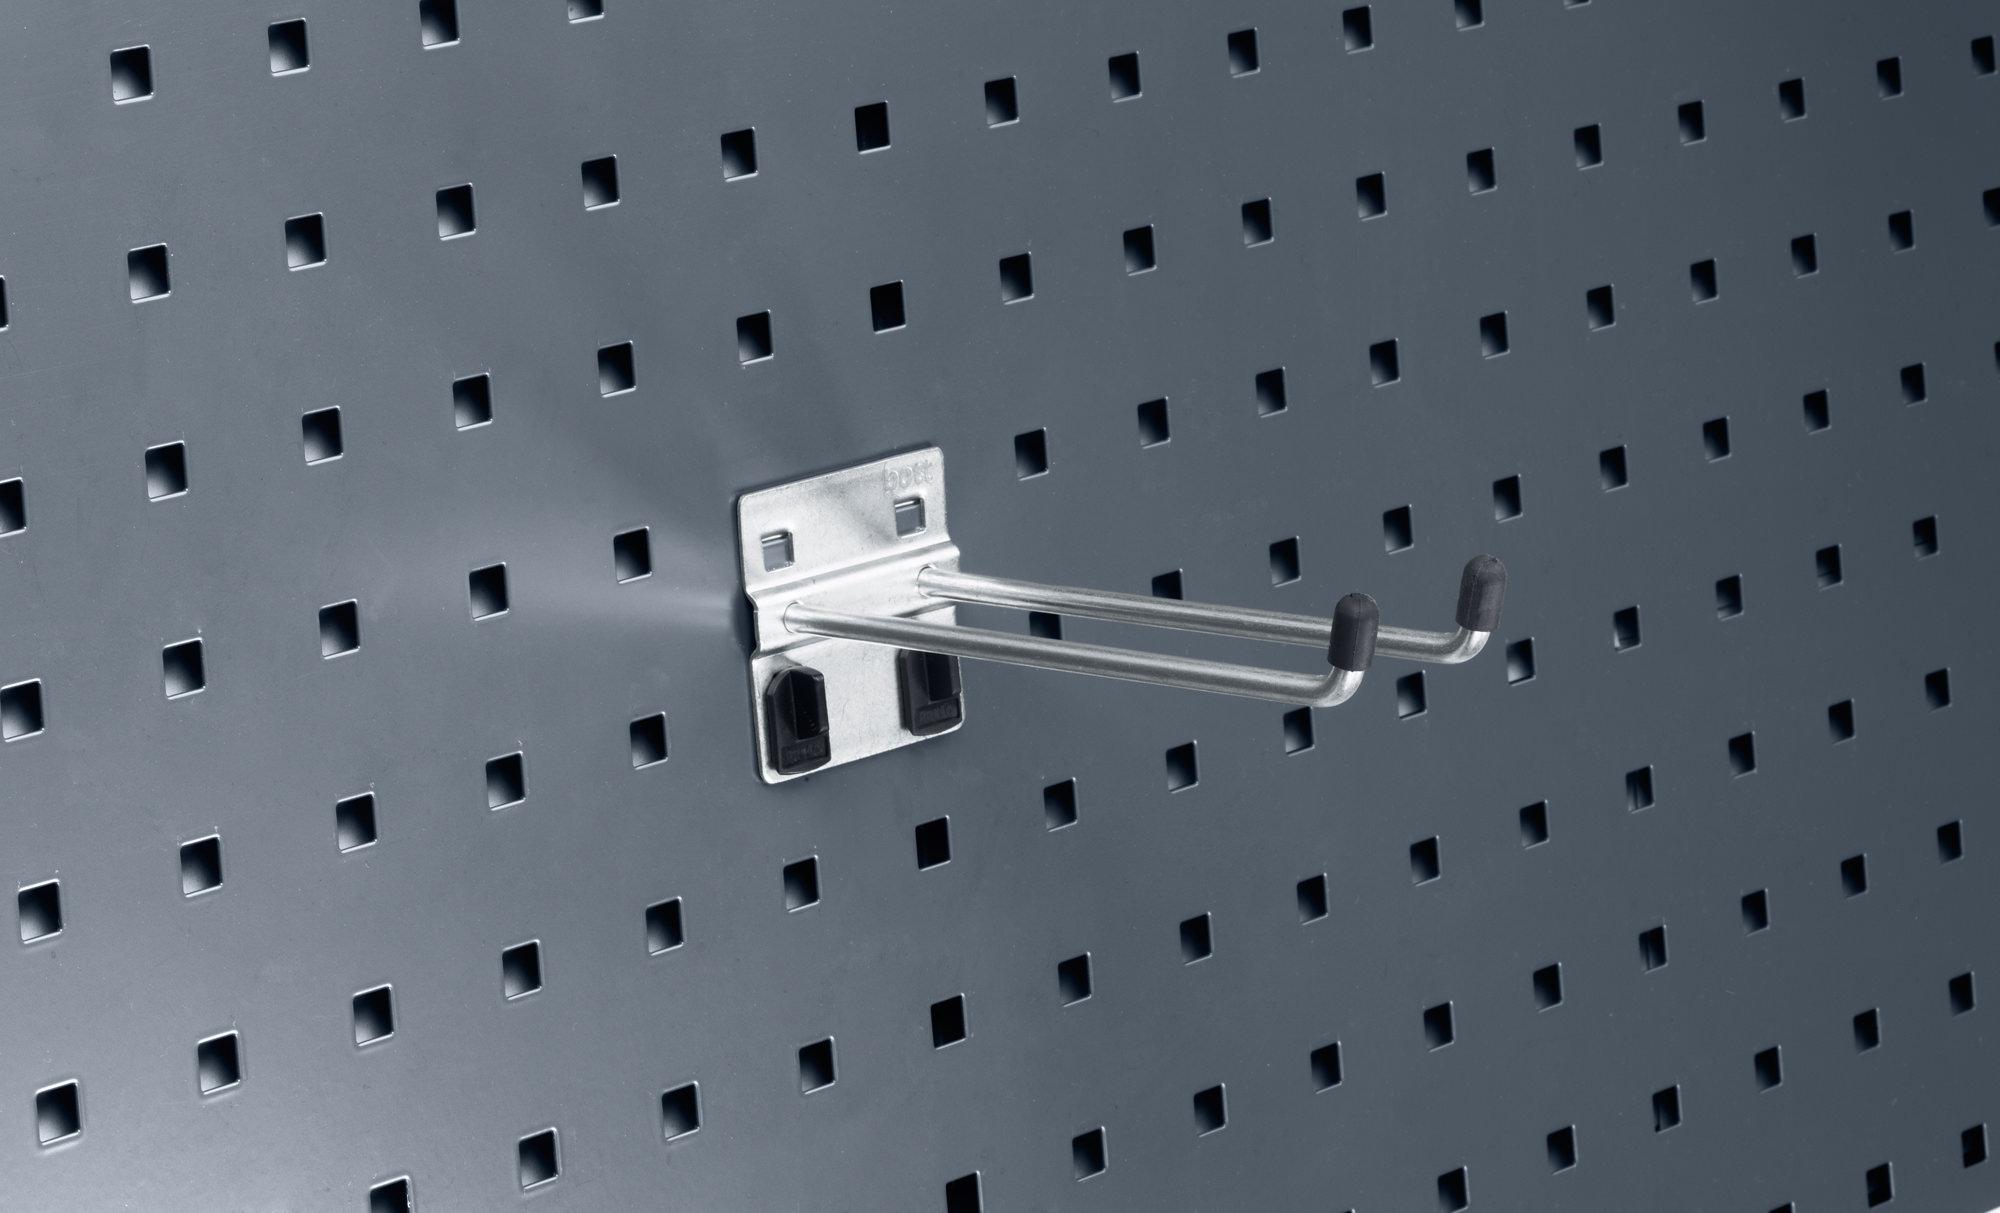 bott perfo B/ügelhaken 14010025 L/änge 150 mm 5 St/ück mit Doppelaufnahme f/ür perfo Lochplatten